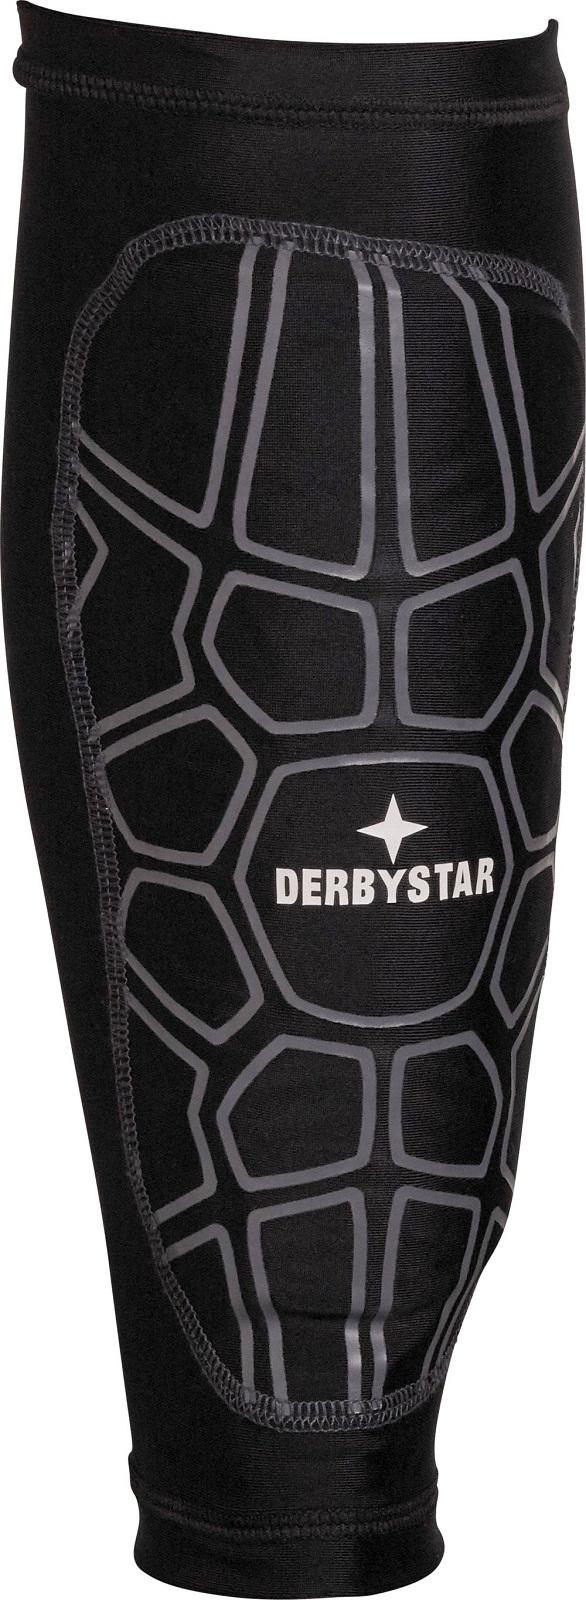 Derbystar Socke Safe